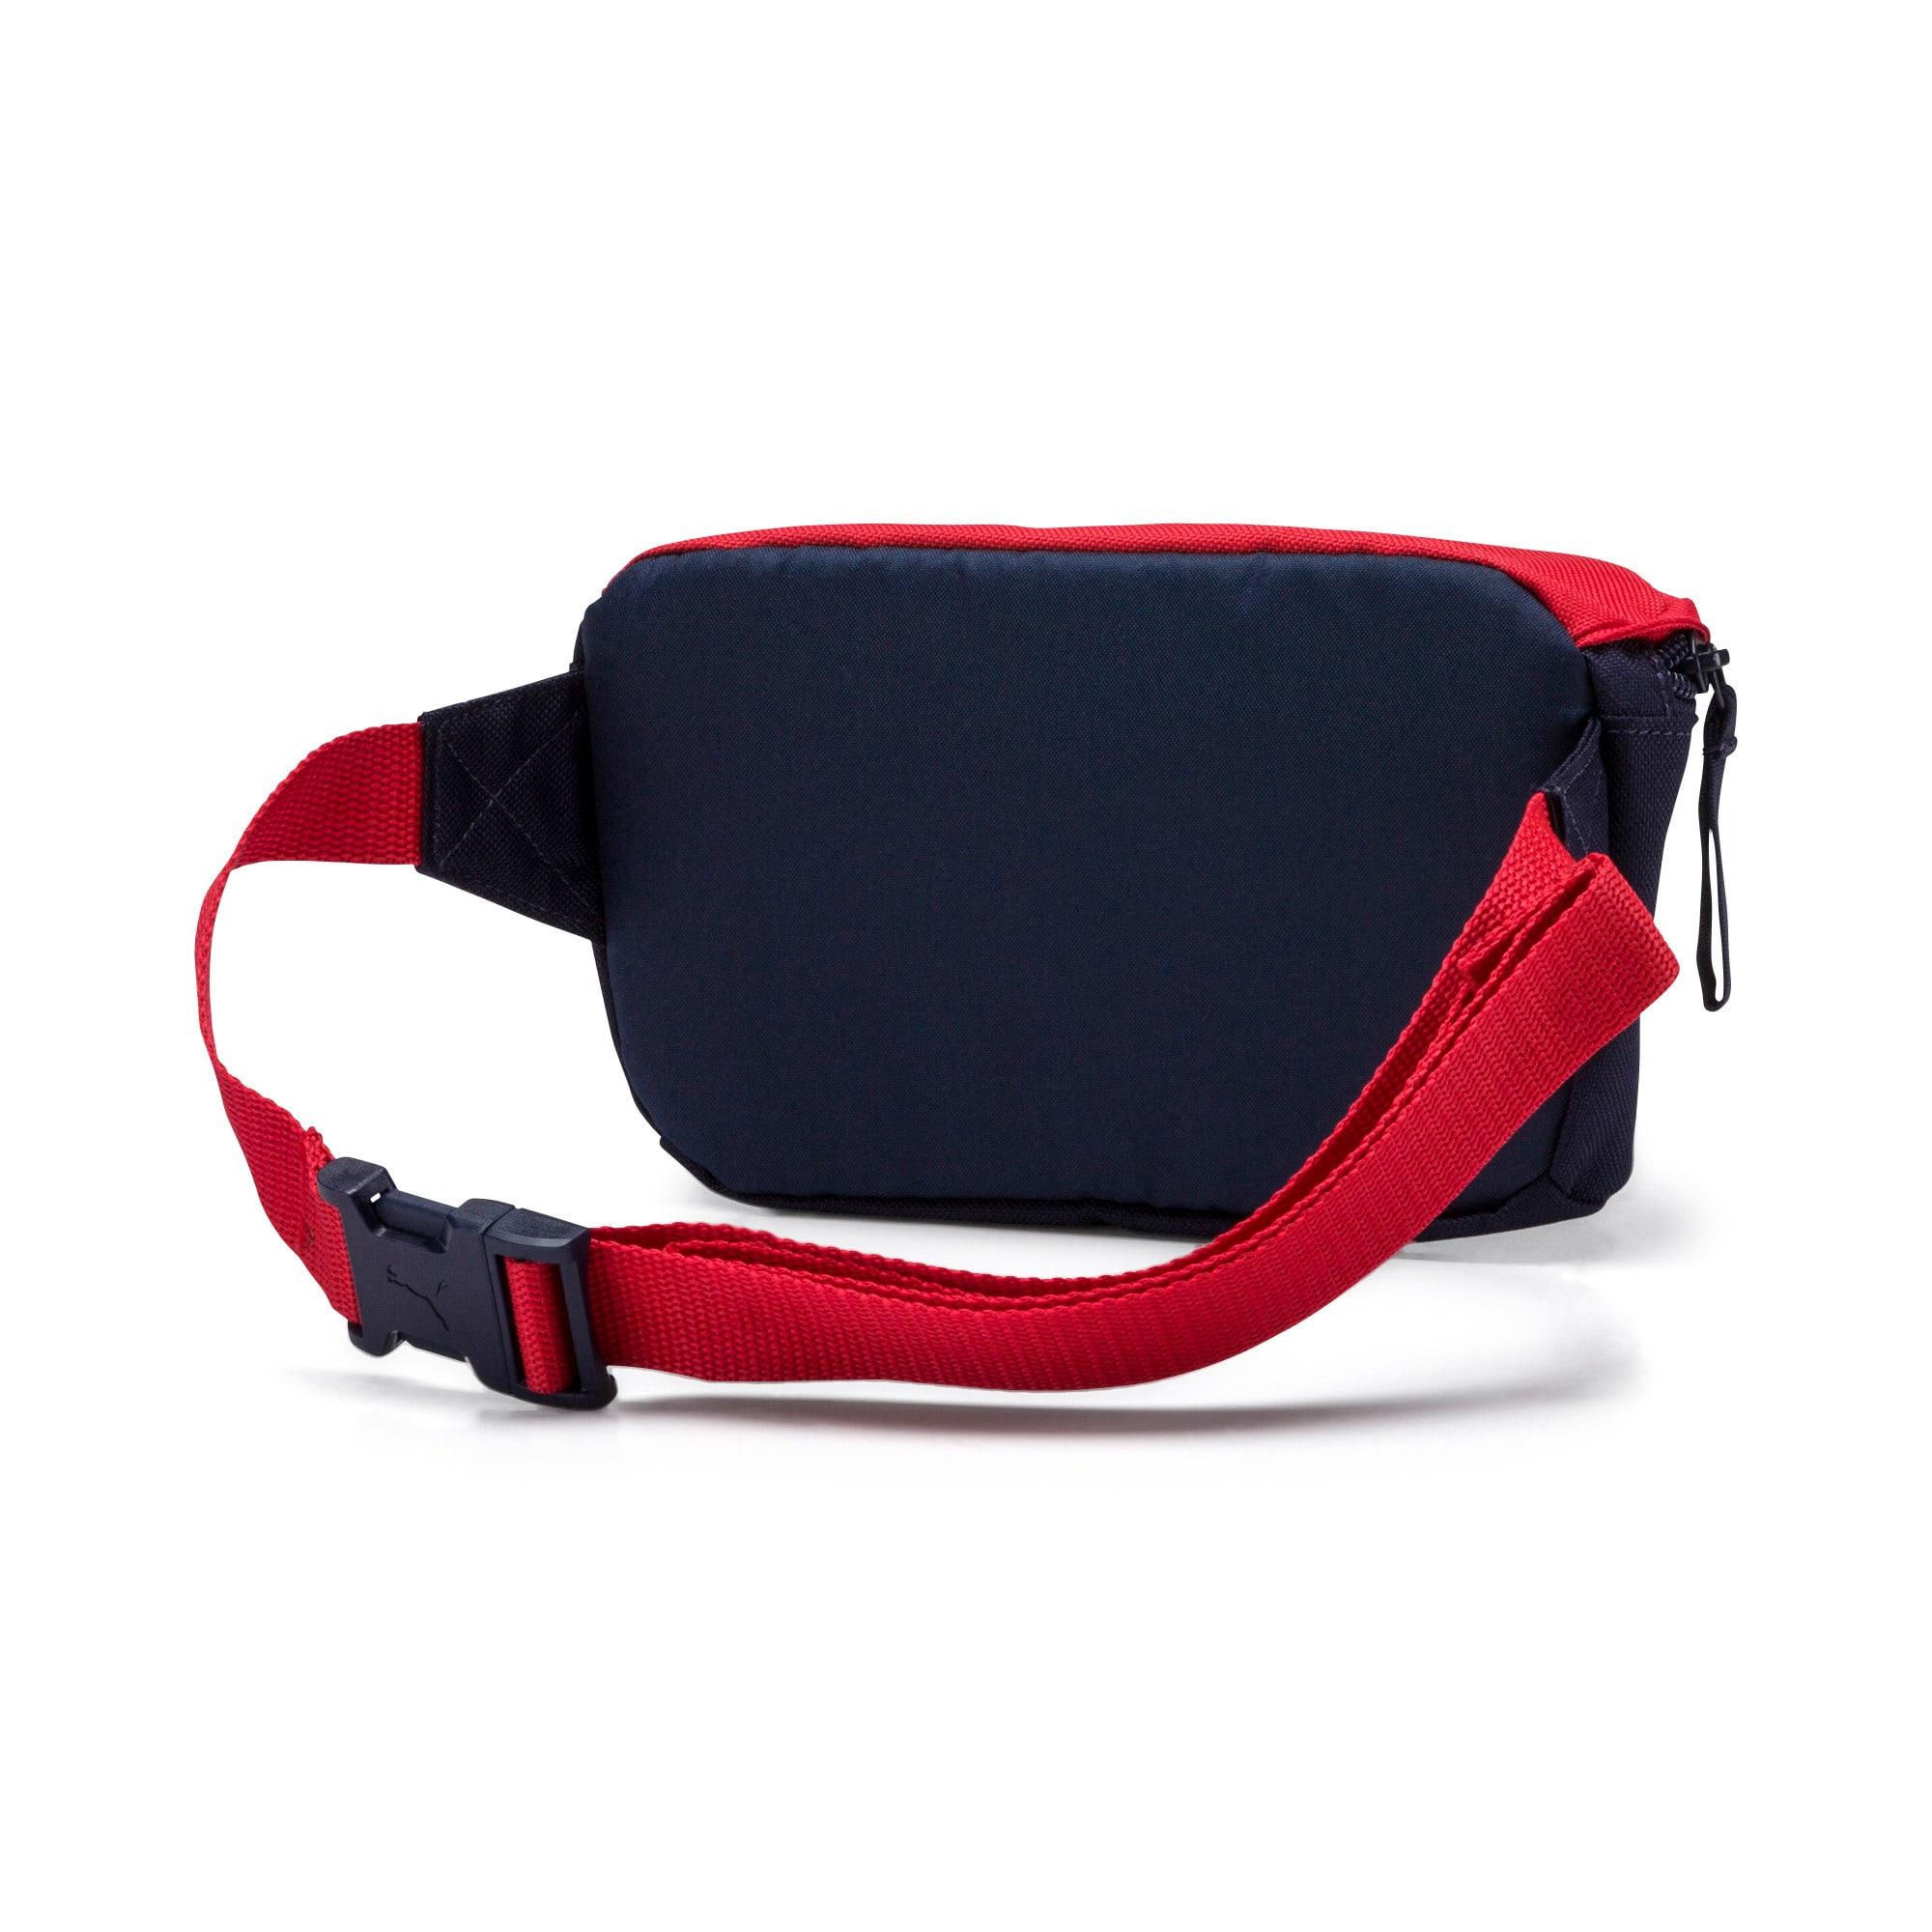 Thumbnail 2 of Plus Waist Bag II, Peacoat-High Risk Red, medium-IND